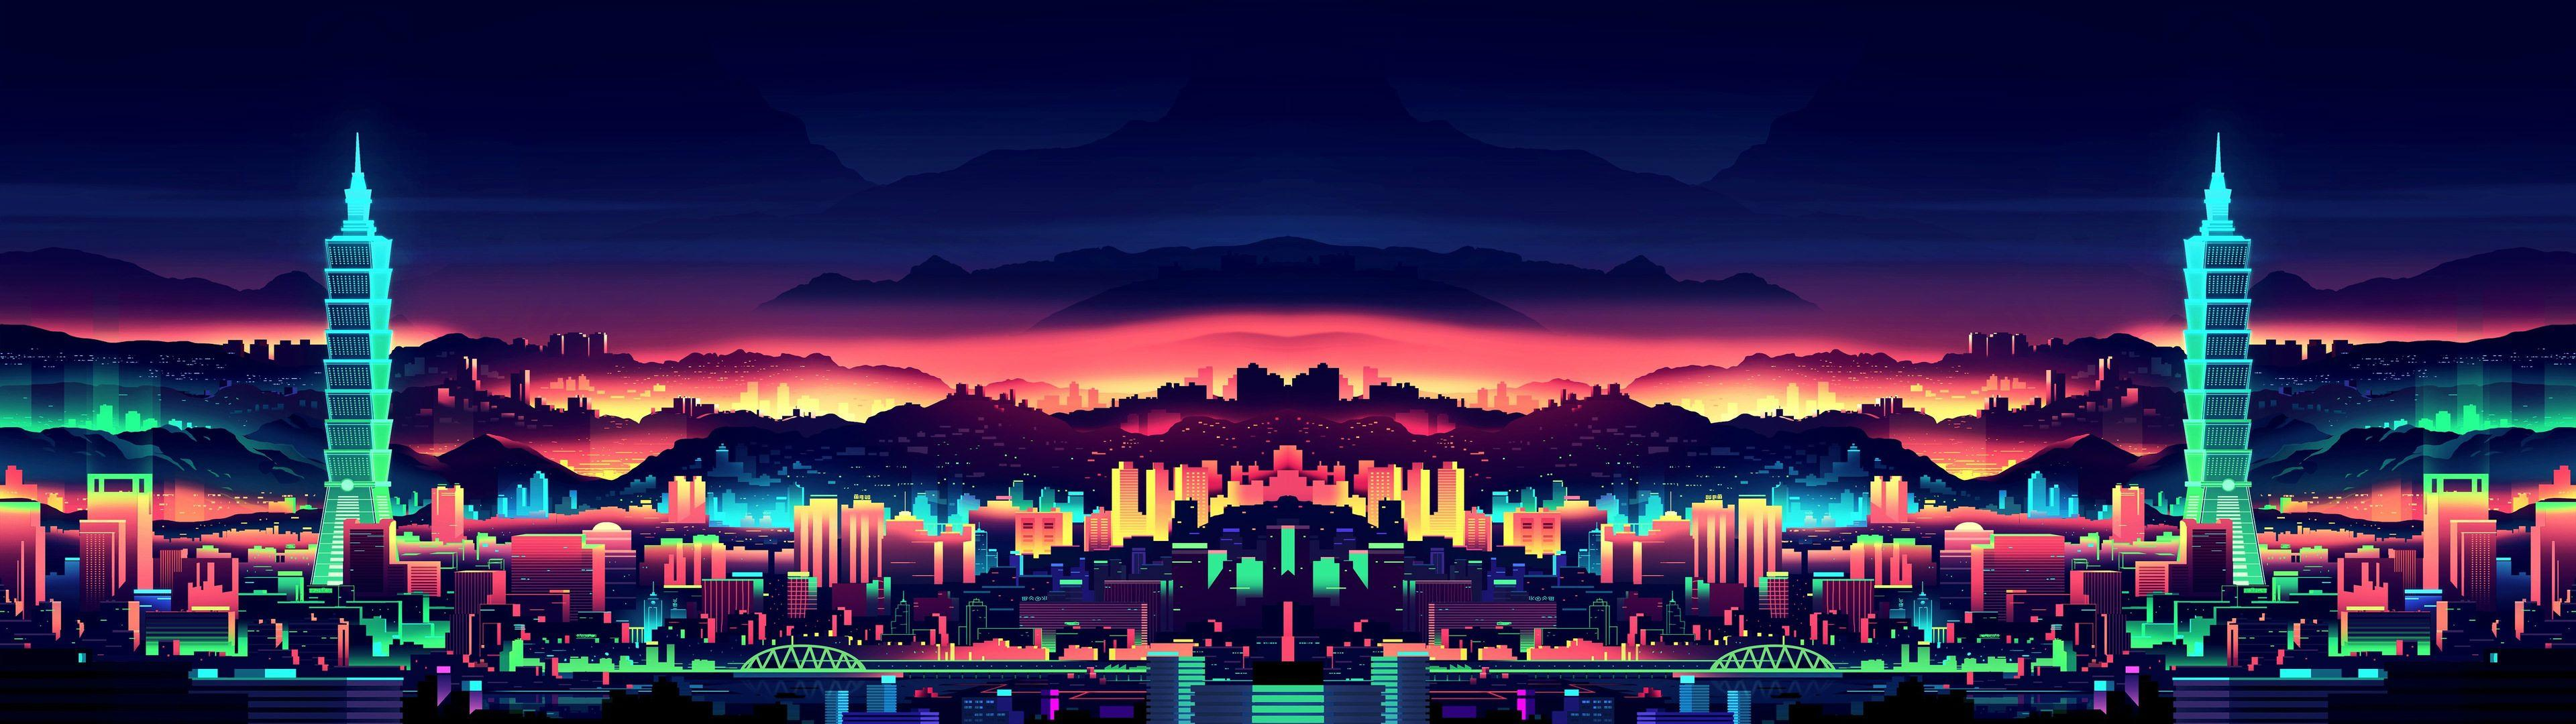 Neon City Computer Wallpapers Wallpaper Cave